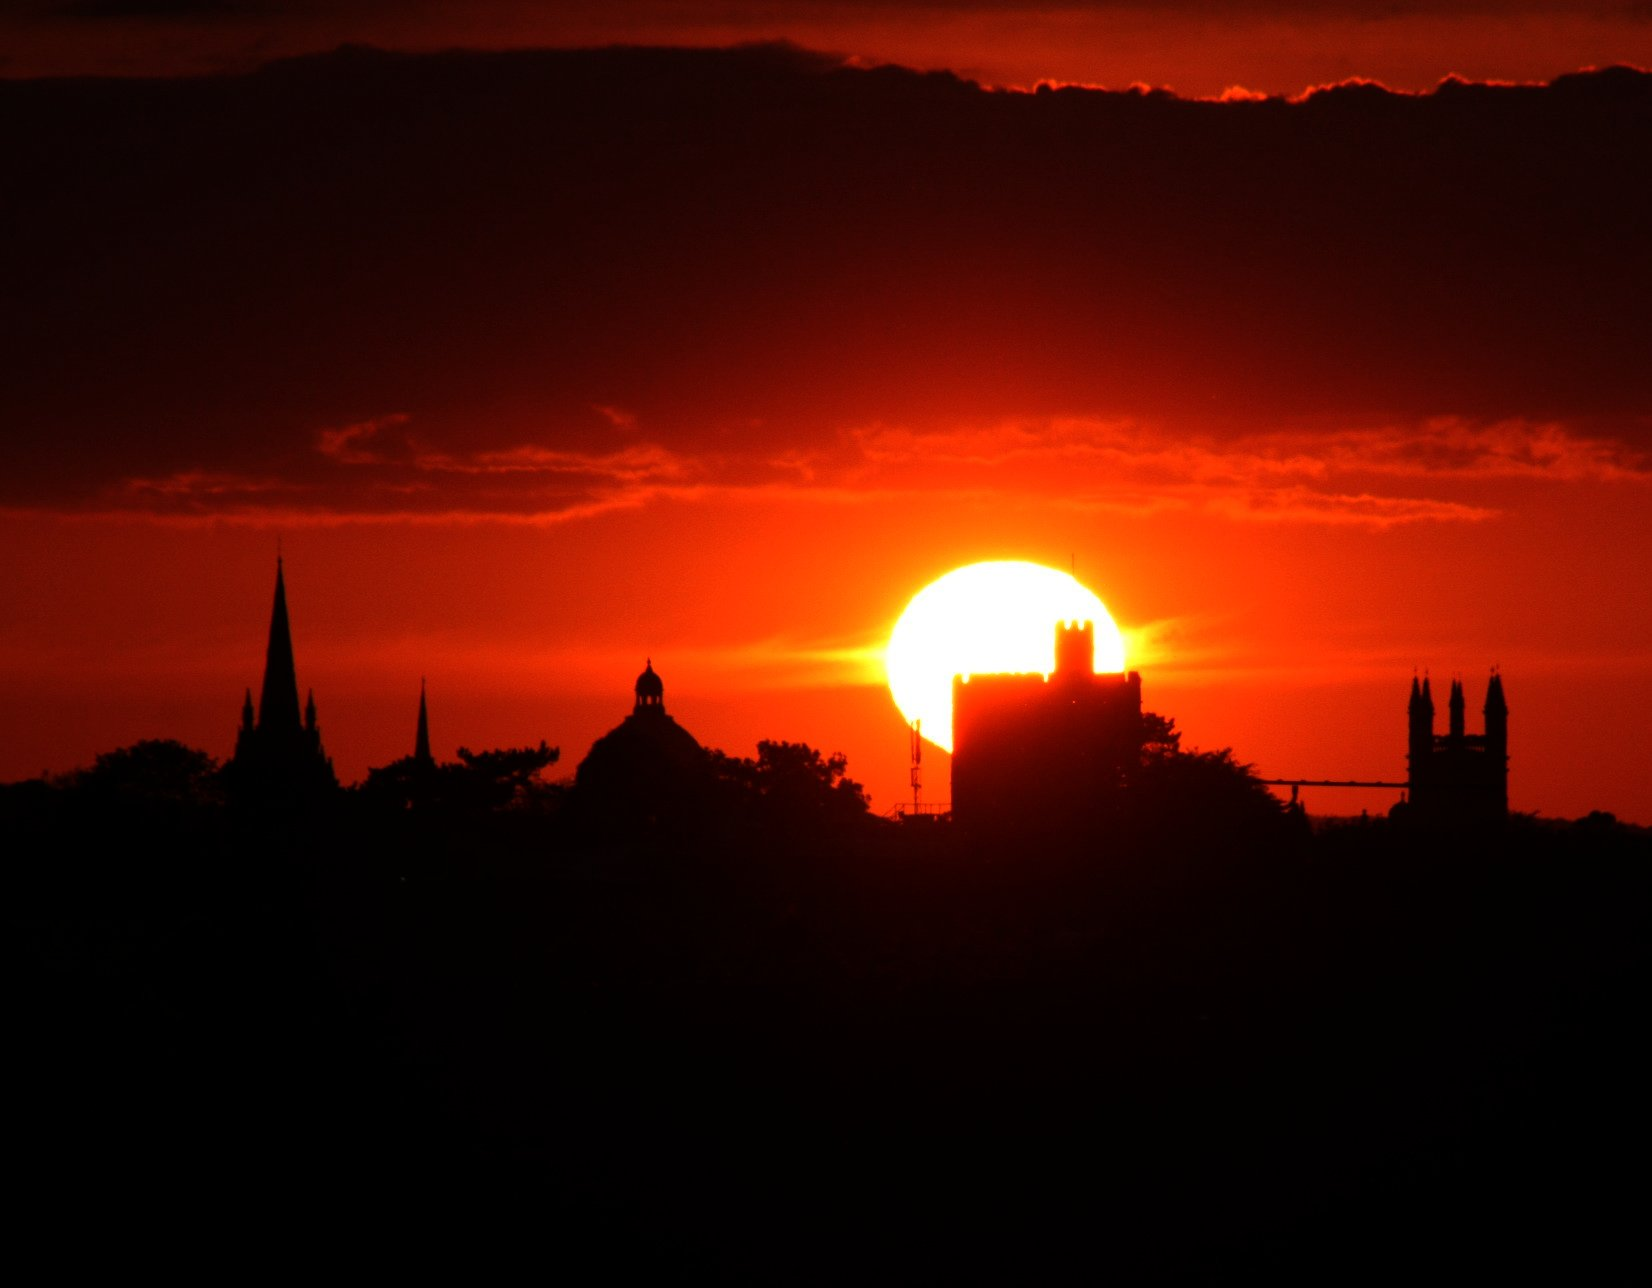 deep red sunset over Oxford skyline